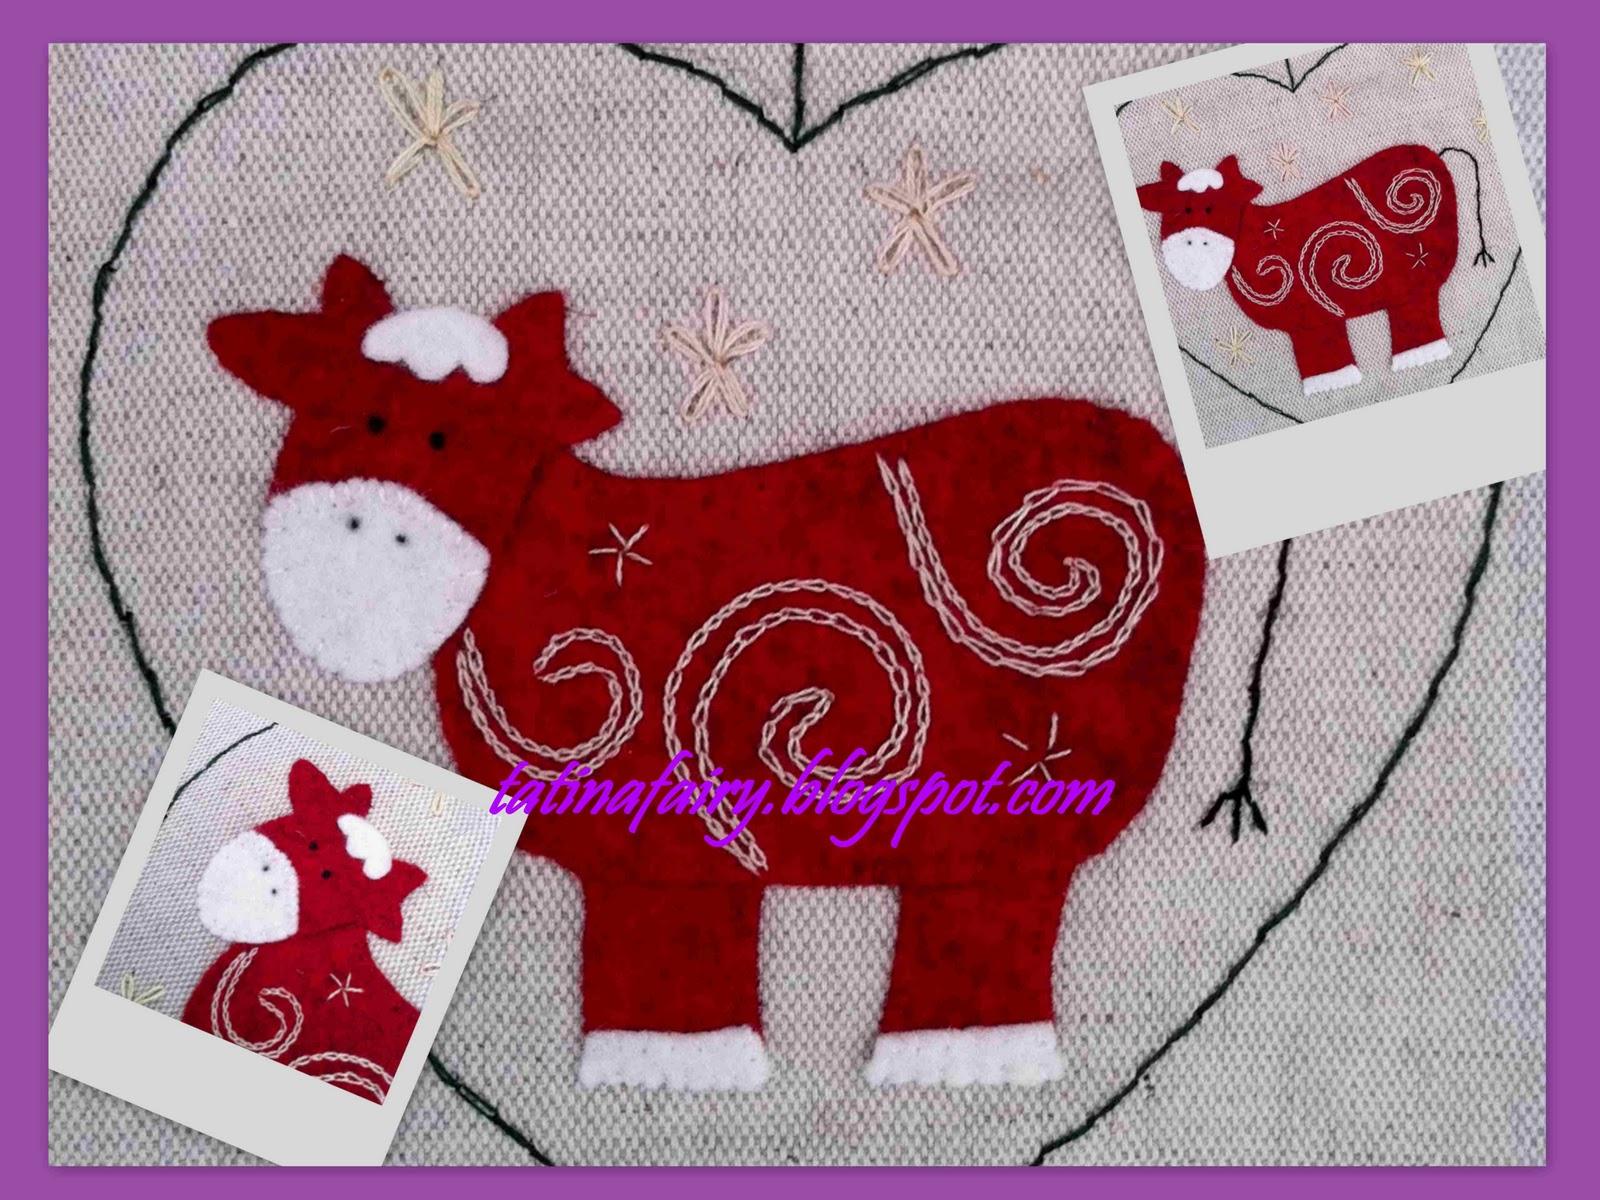 Paola fairy mucca e diversi tipi di punto - Diversi tipi di carta ...